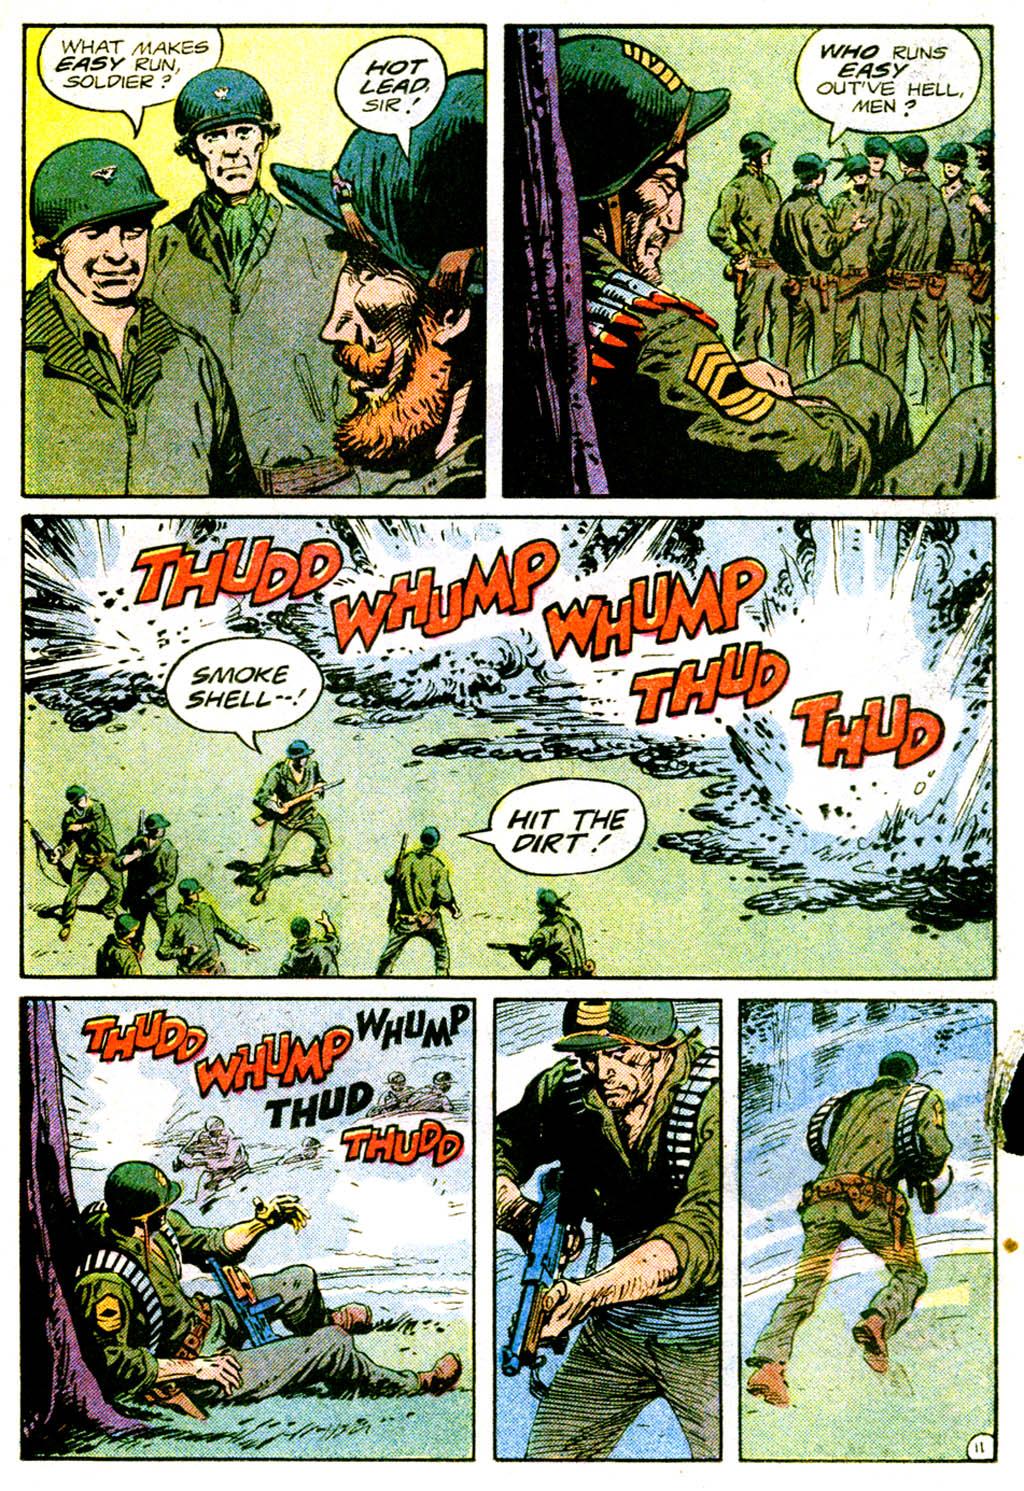 Read online Sgt. Rock comic -  Issue #362 - 14